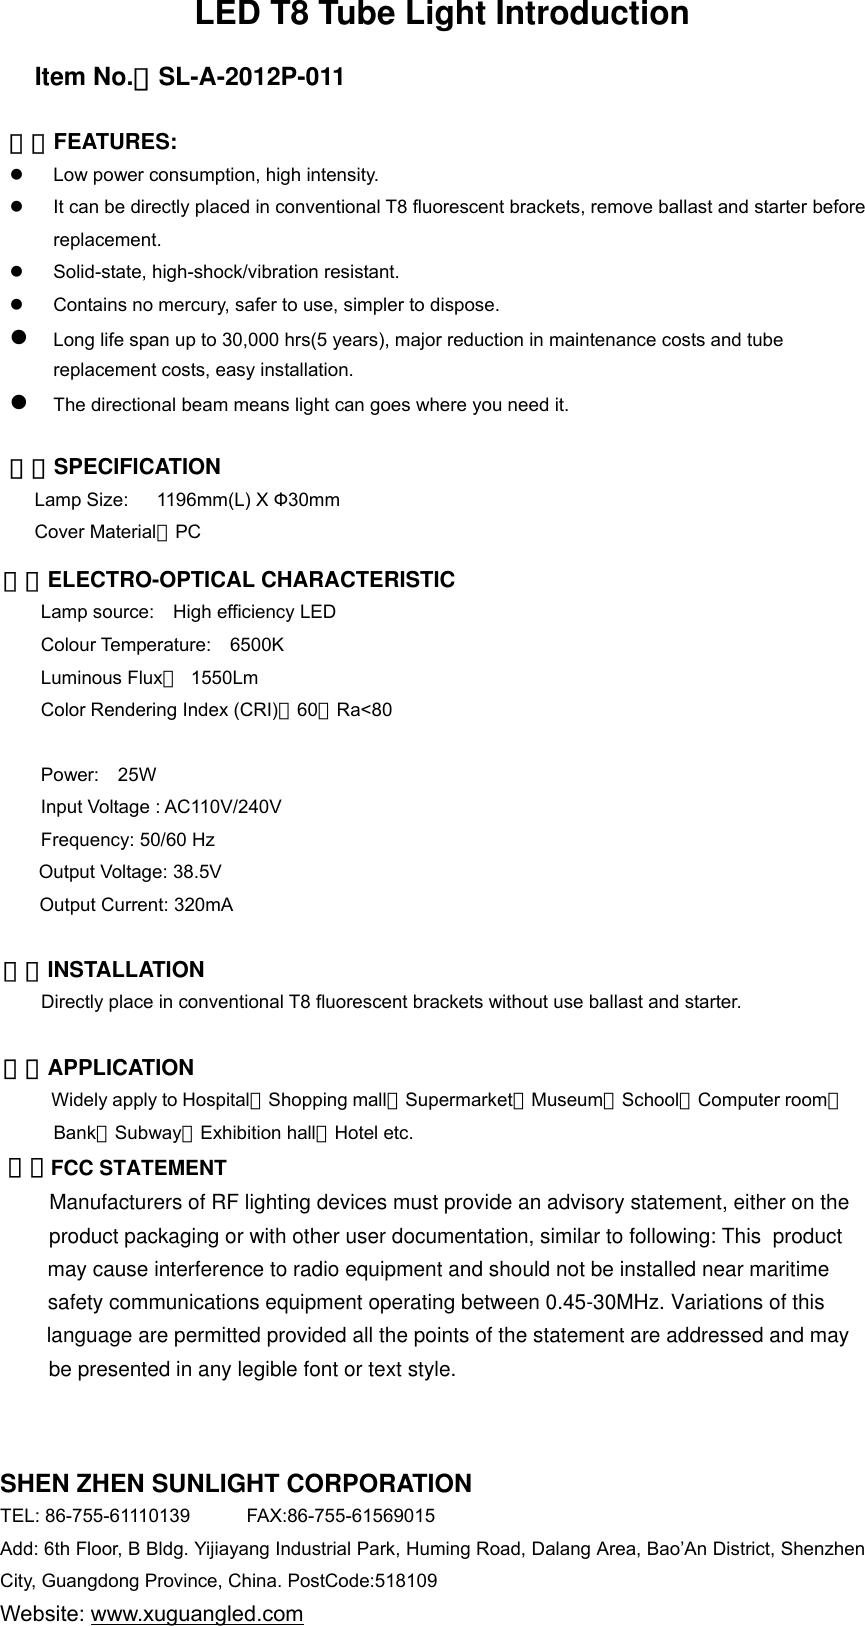 Sunlight sl a 2012p 011 led t8 tube user manual publicscrutiny Choice Image